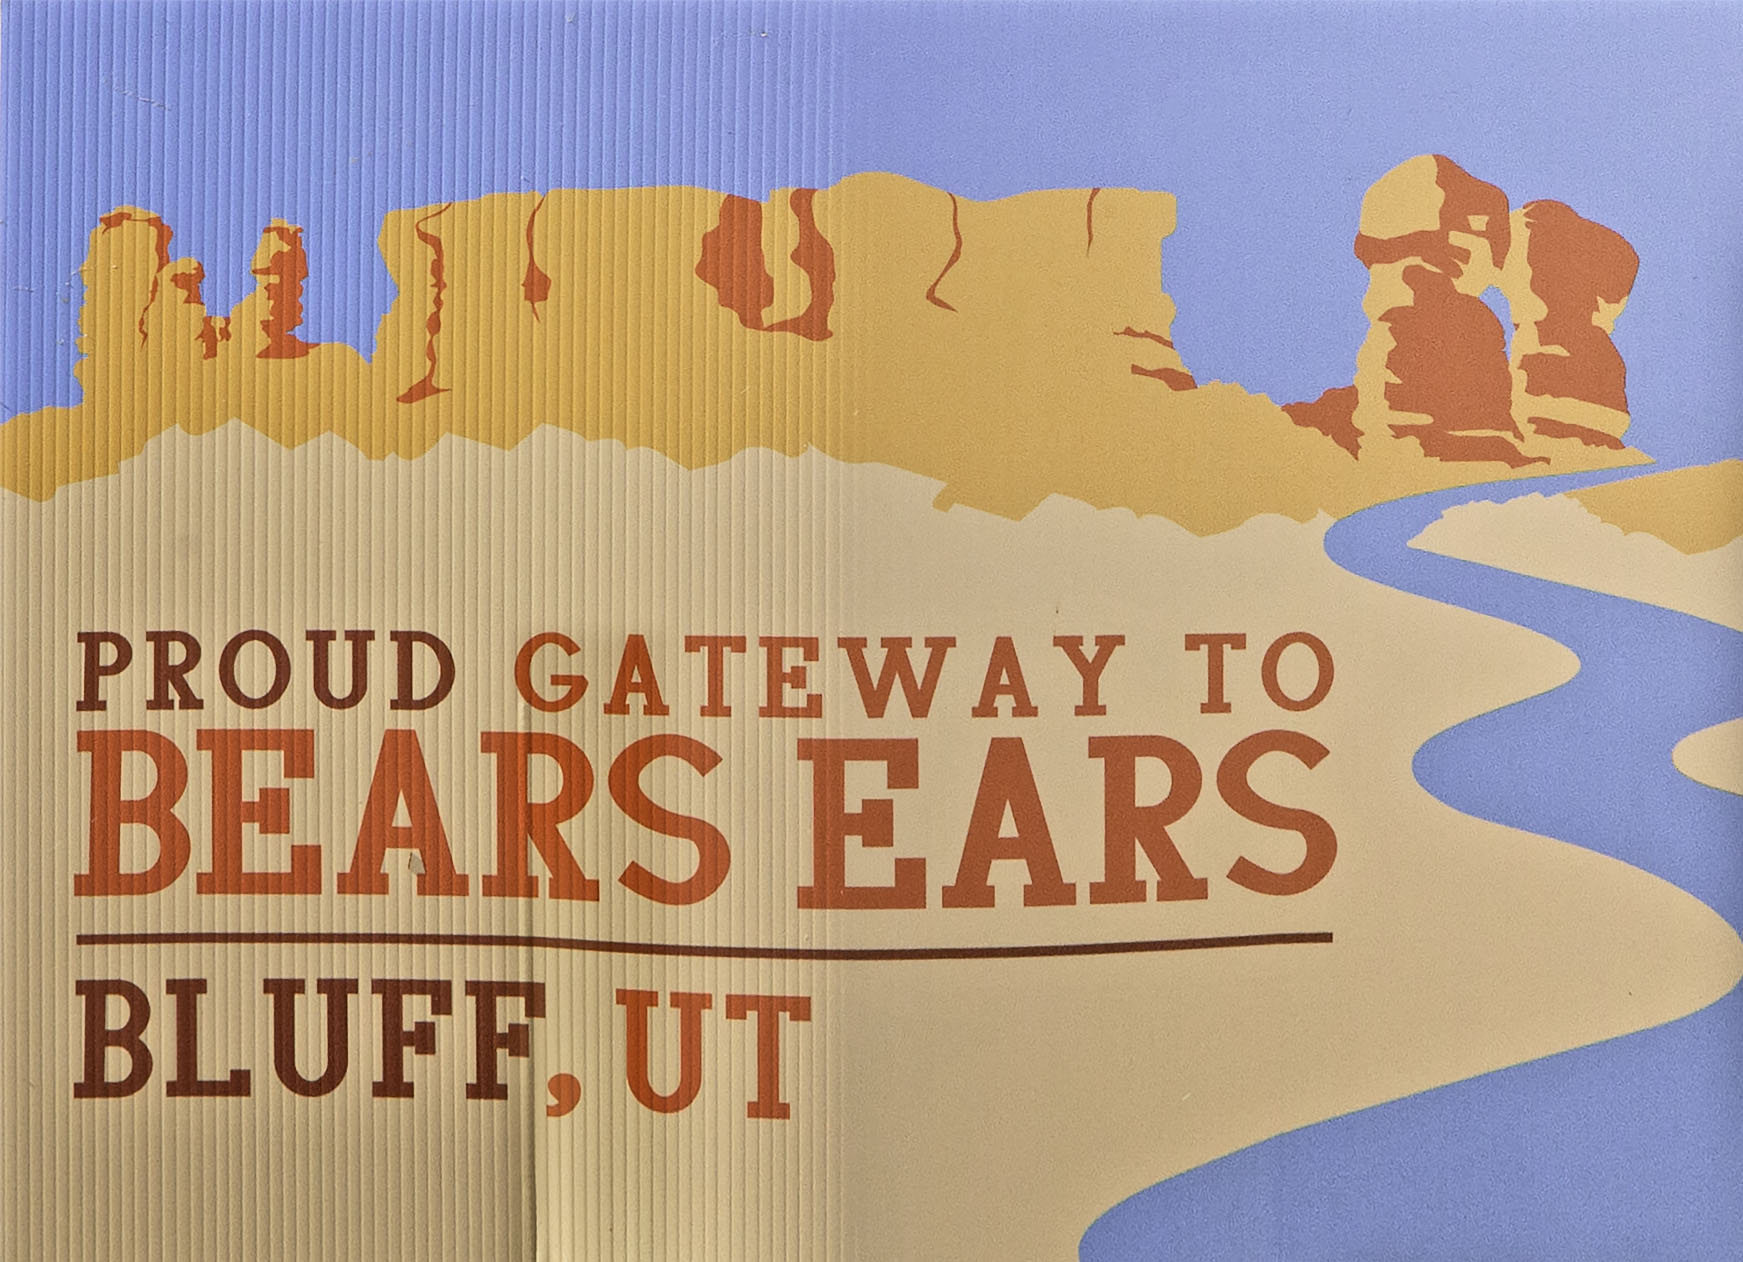 Gateway_to_Bears_Ears.jpg